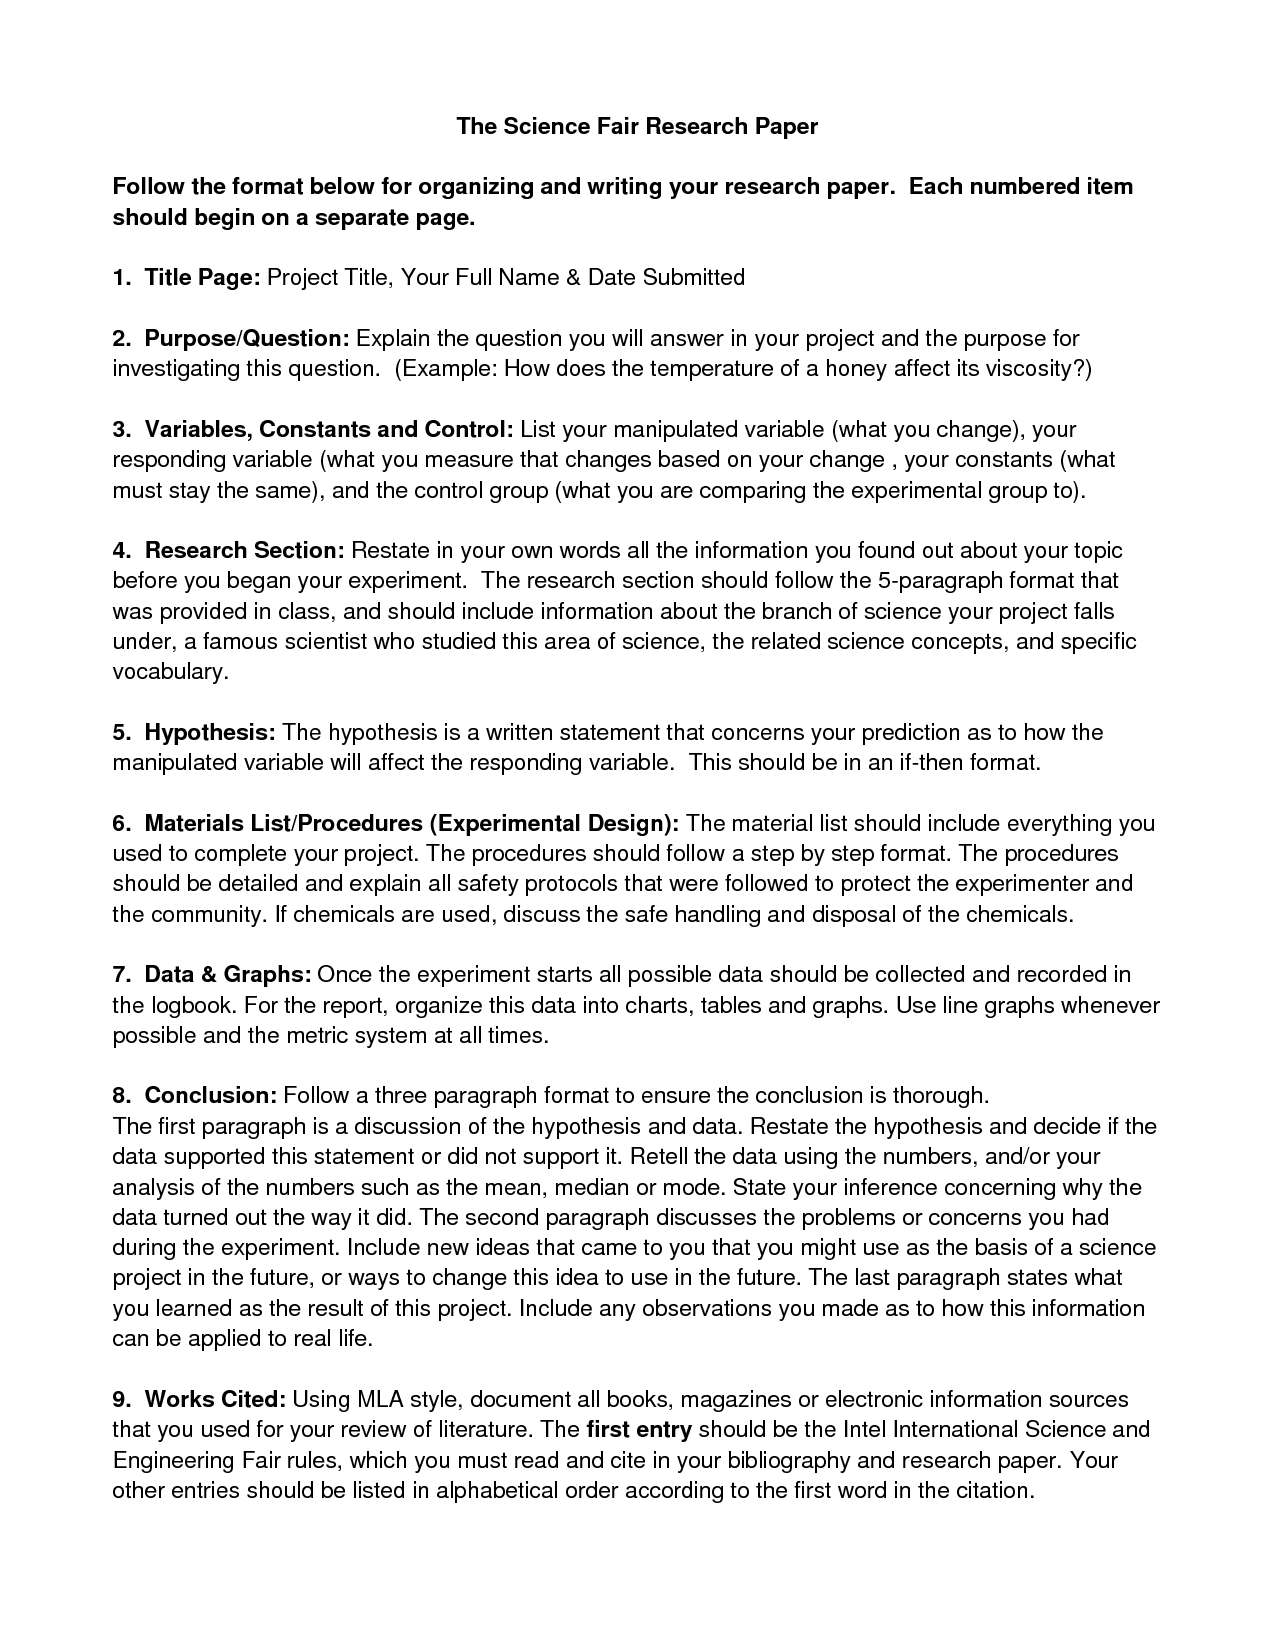 10 Stylish List Of Science Fair Ideas ideas of science fair research paper outline unique political 2020